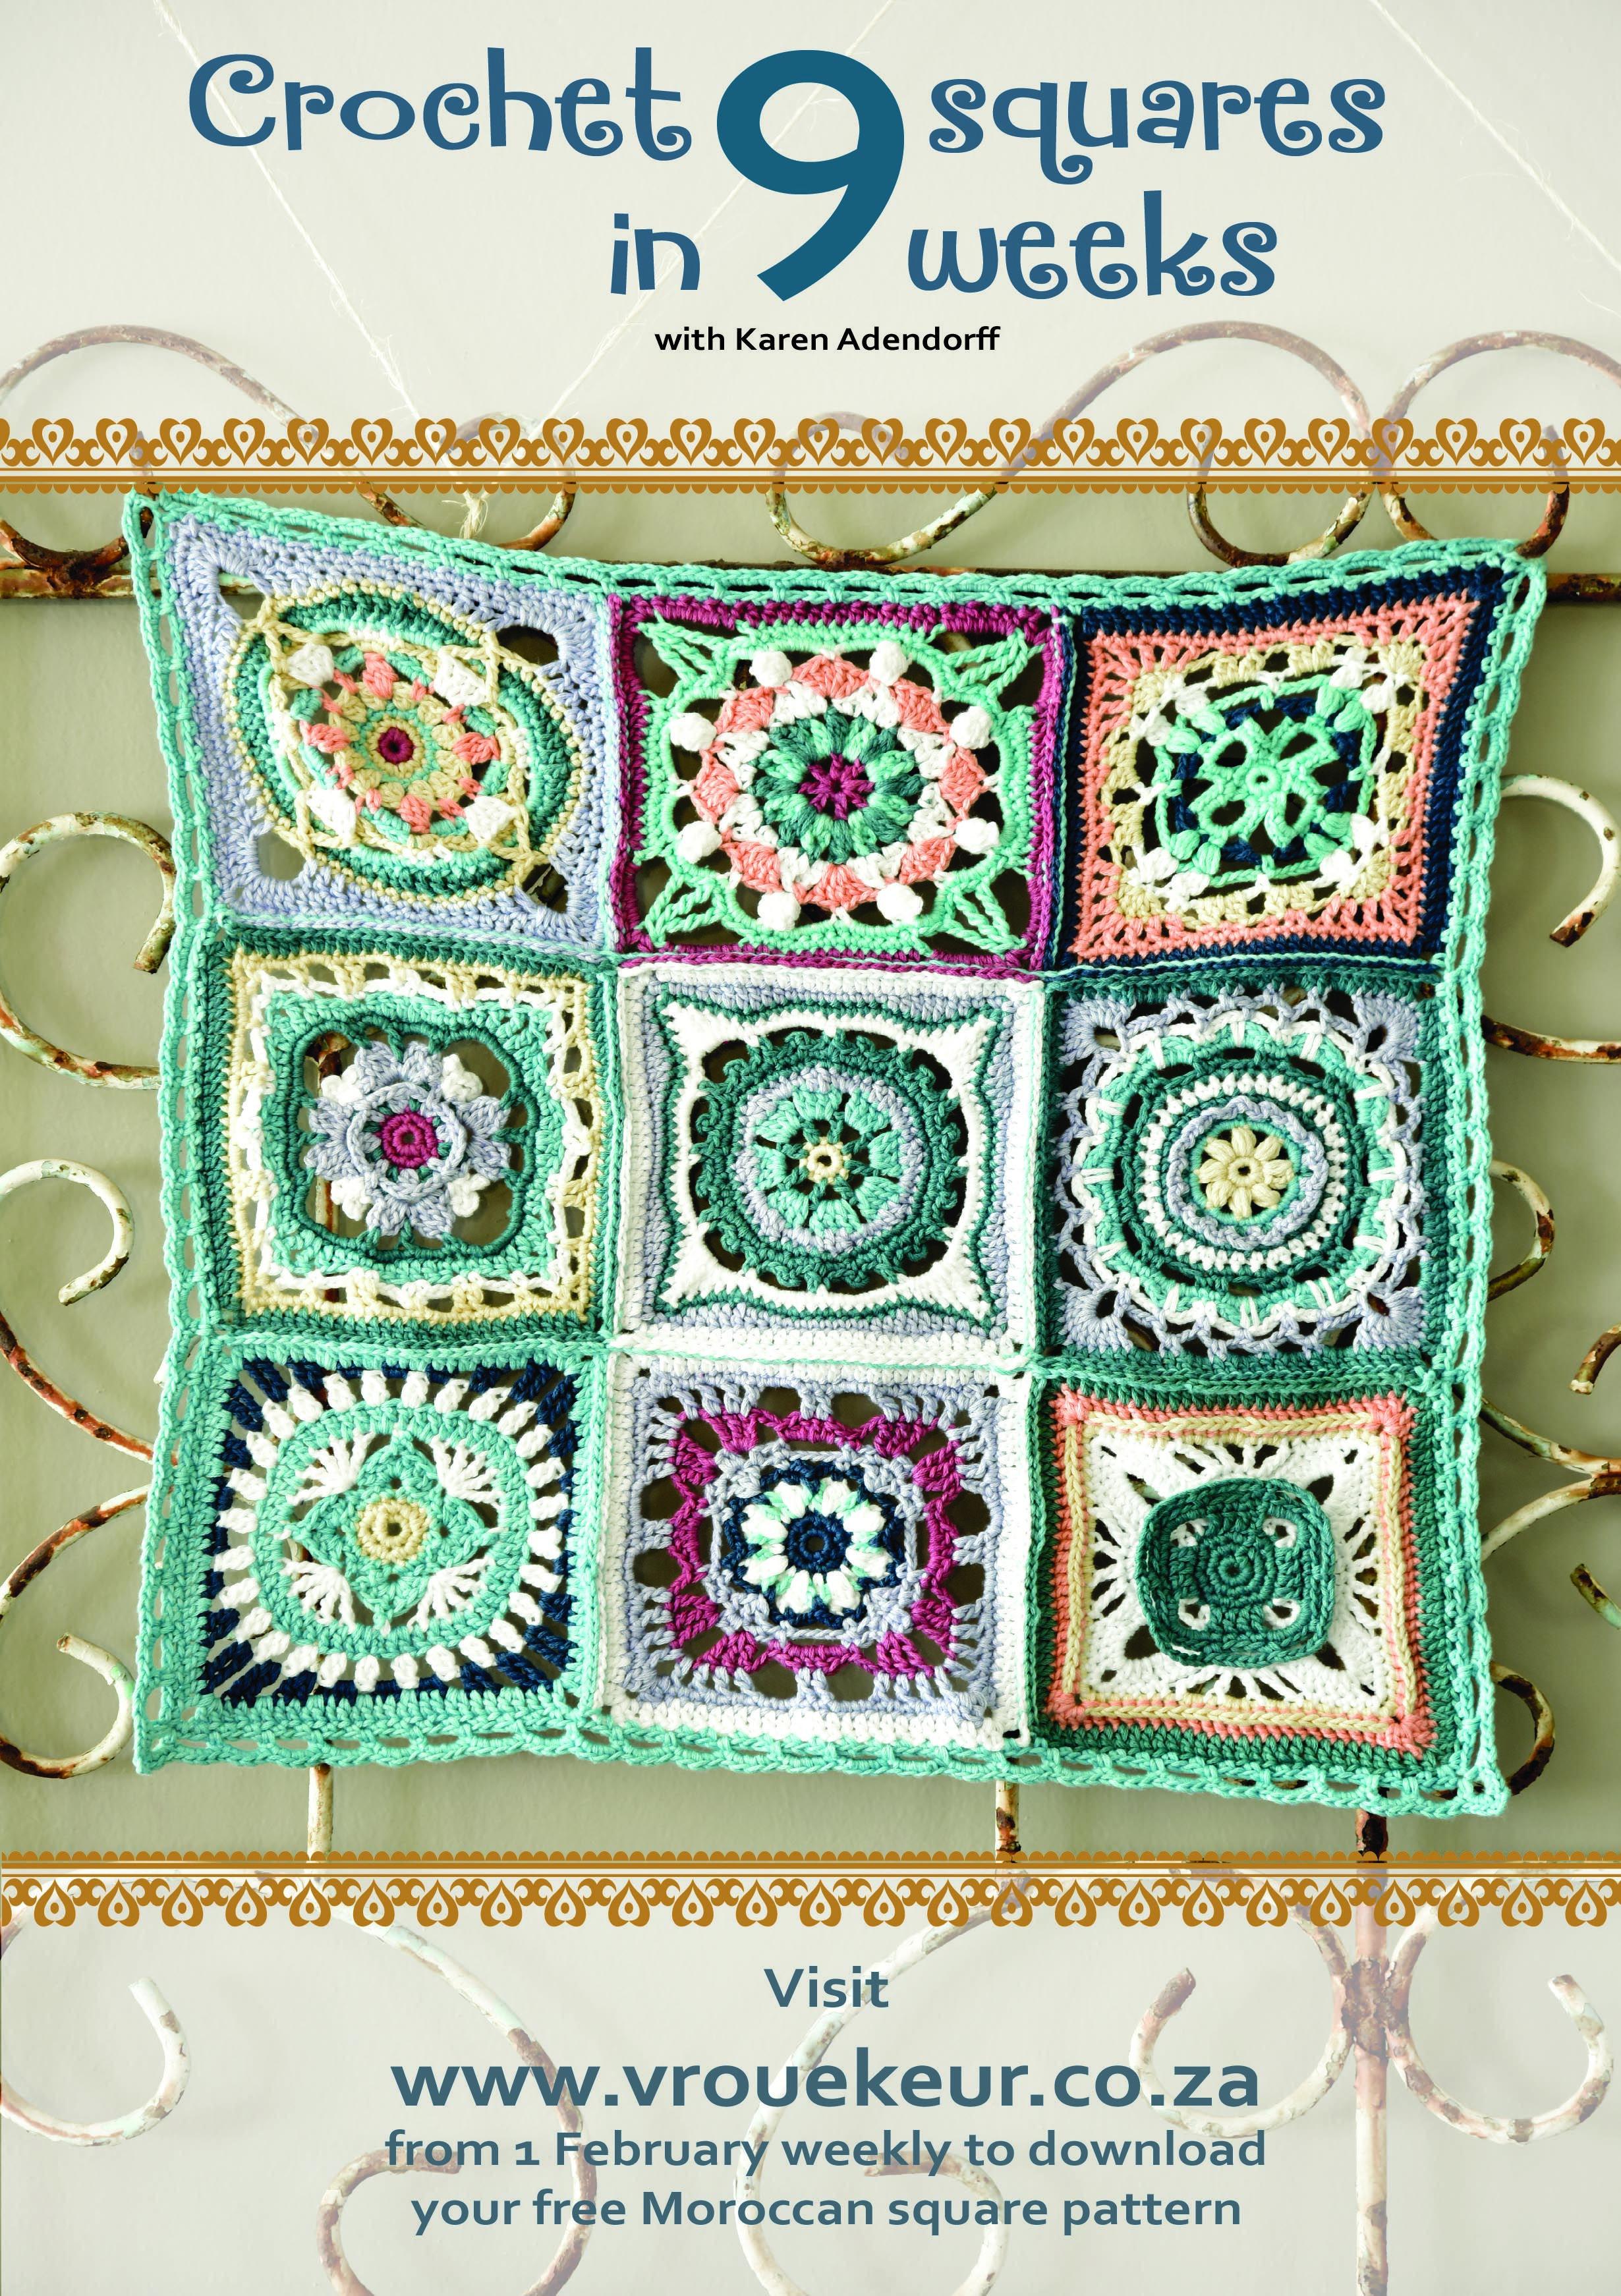 Pin de Karen Adendorff en Free Crochet patterns | Pinterest ...